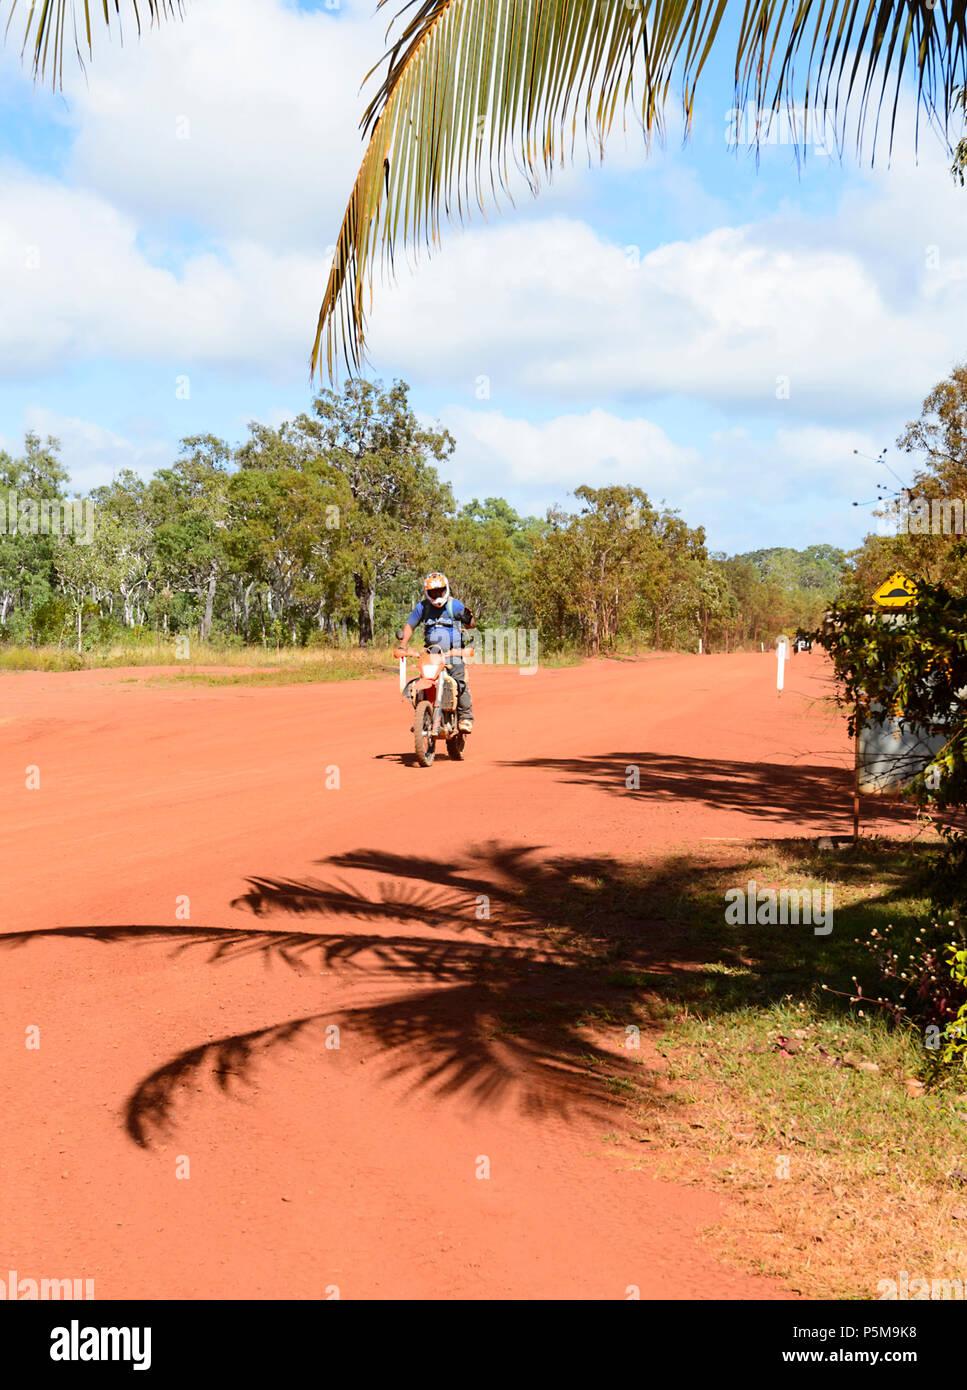 Motorbiker riding a dirt bike on a remote red dirt road, Cape York Peninsula, Far North Queensland, FNQ, QLD, Australia - Stock Image